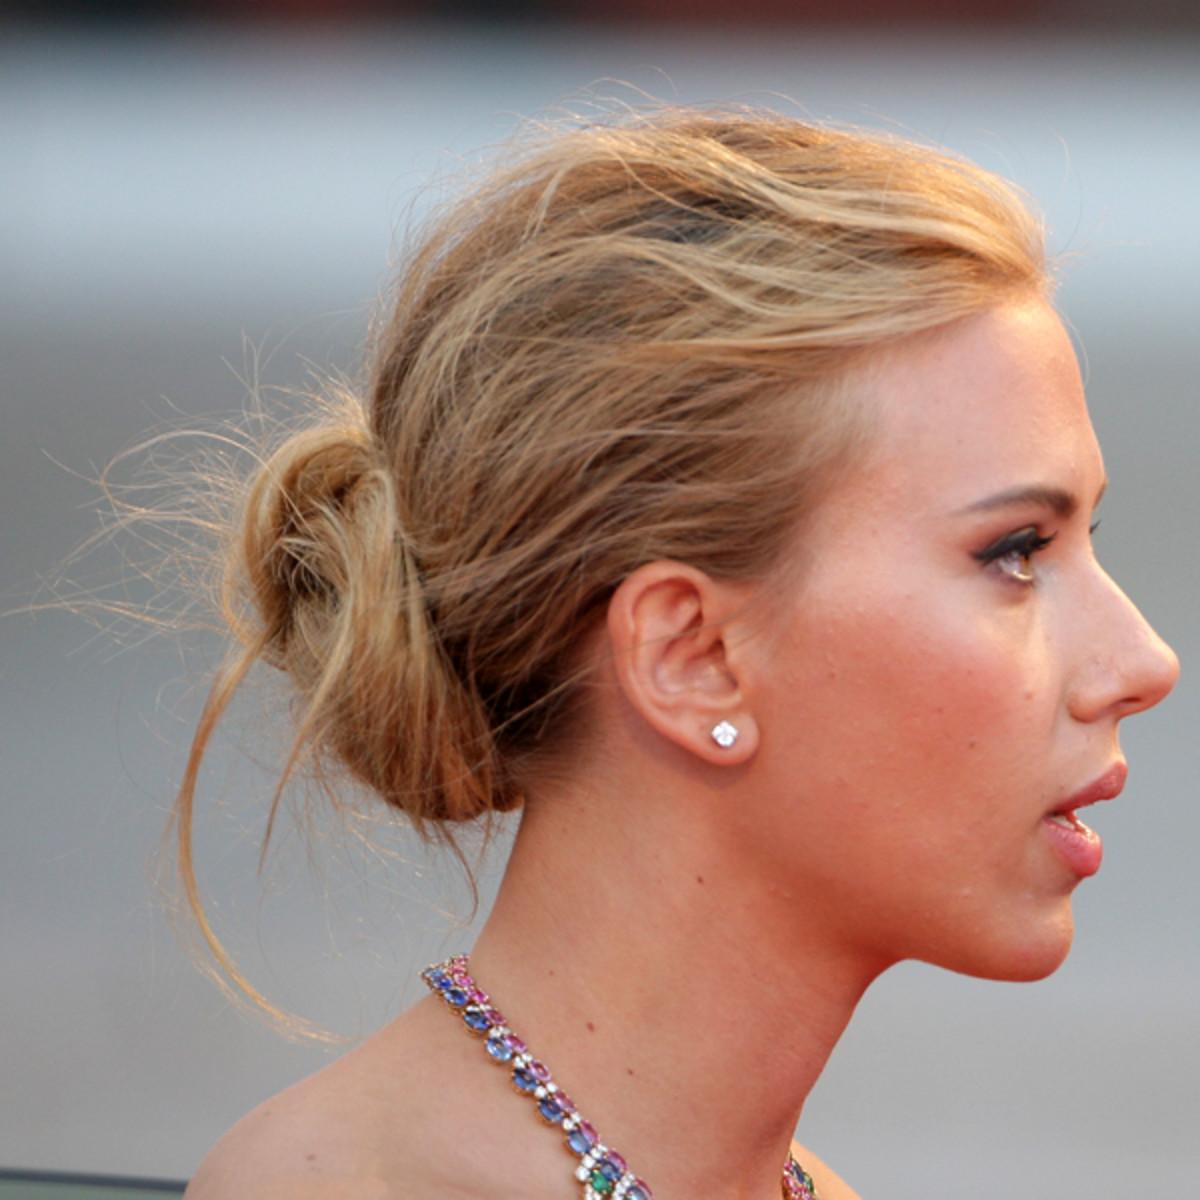 Scarlett Johansson hair - messy bun